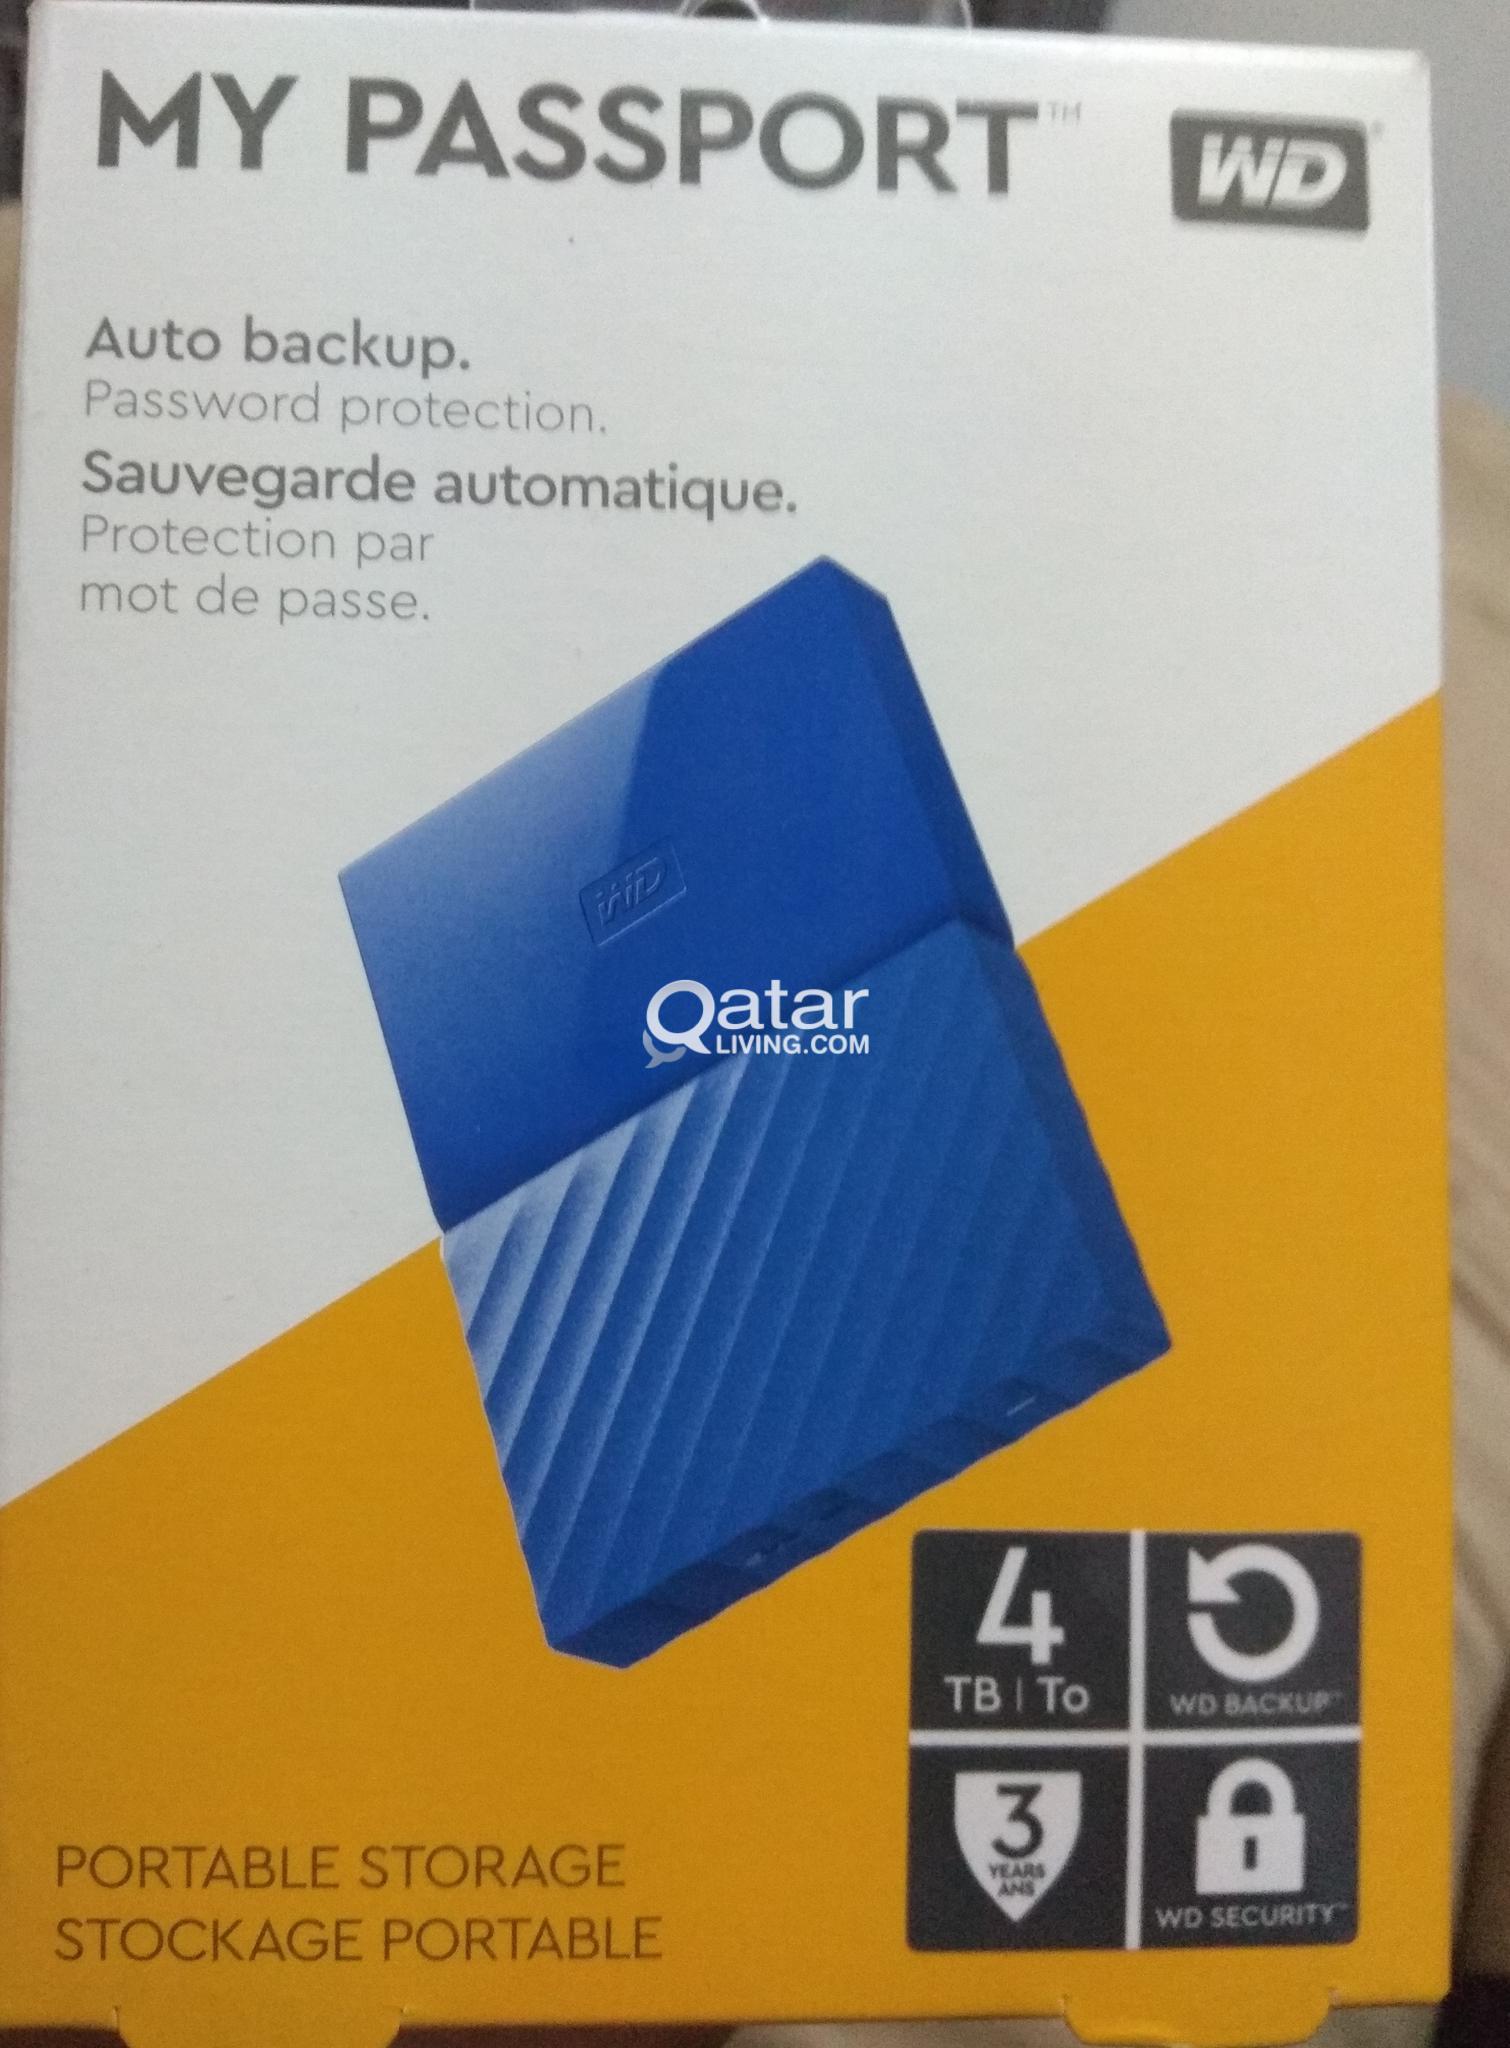 WD Mypassport Ext  Hard disk 4TB | Qatar Living